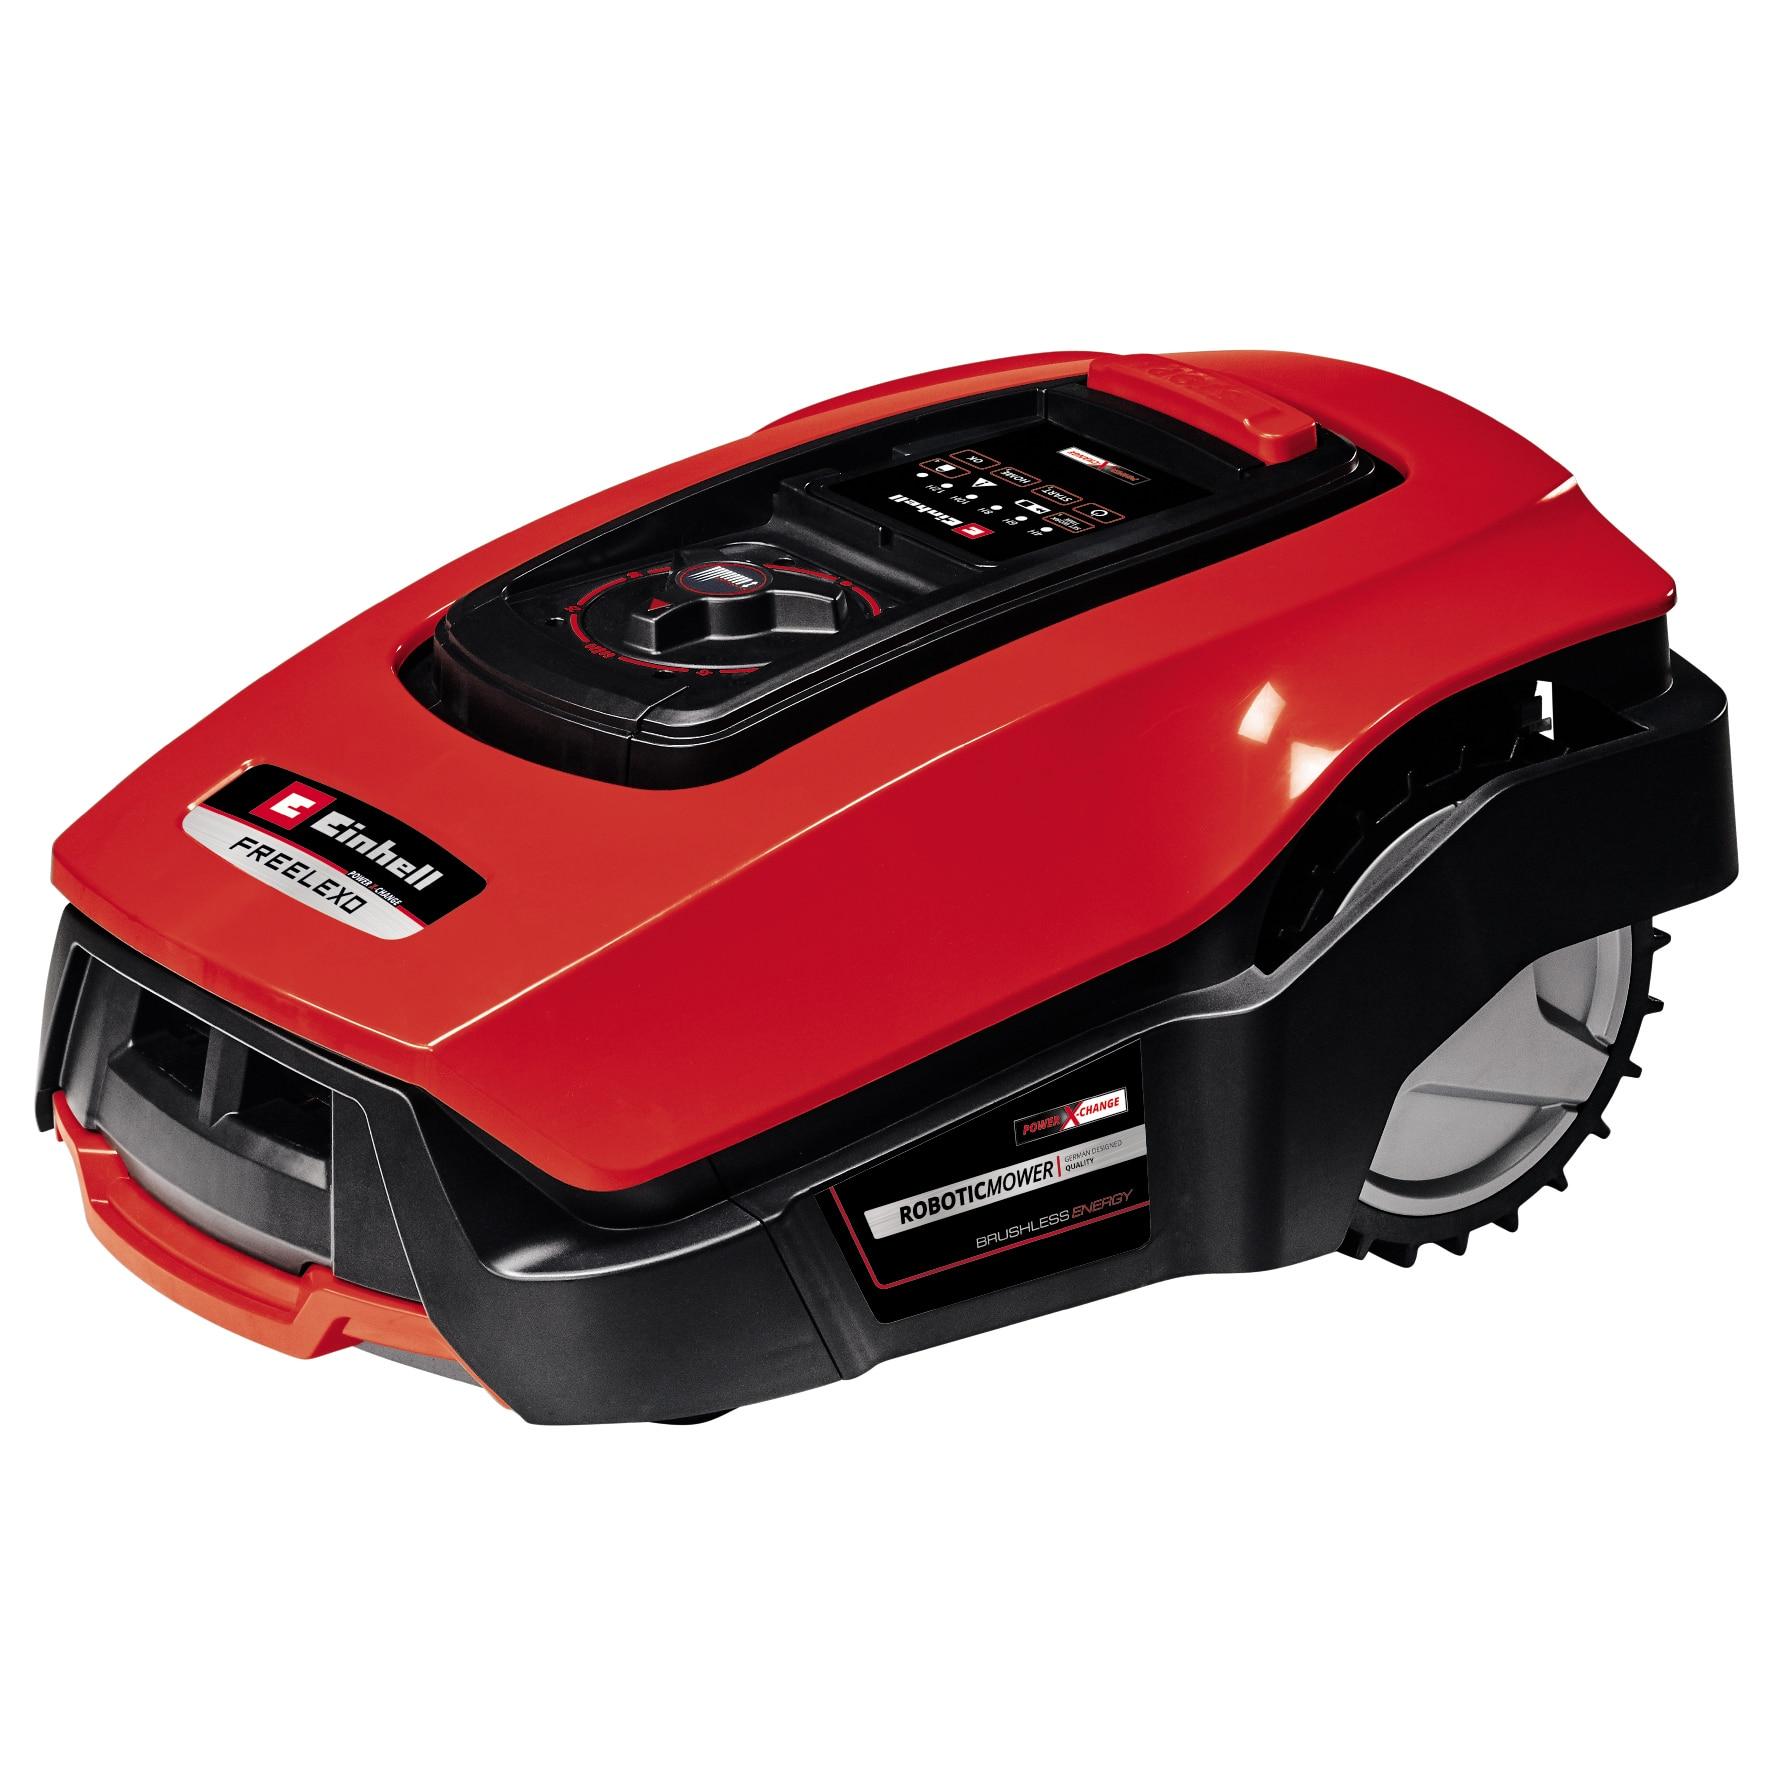 Fotografie Masina electrica robotizata de tuns gazonul Einhell Freelexo Kit 600, 18 V|2,5 Ah Li-Ion, latime taiere 18 cm, inaltime taiere 20 - 60 mm, Bluetooth,senzor ploaie,suprafata recomandata 600 m²